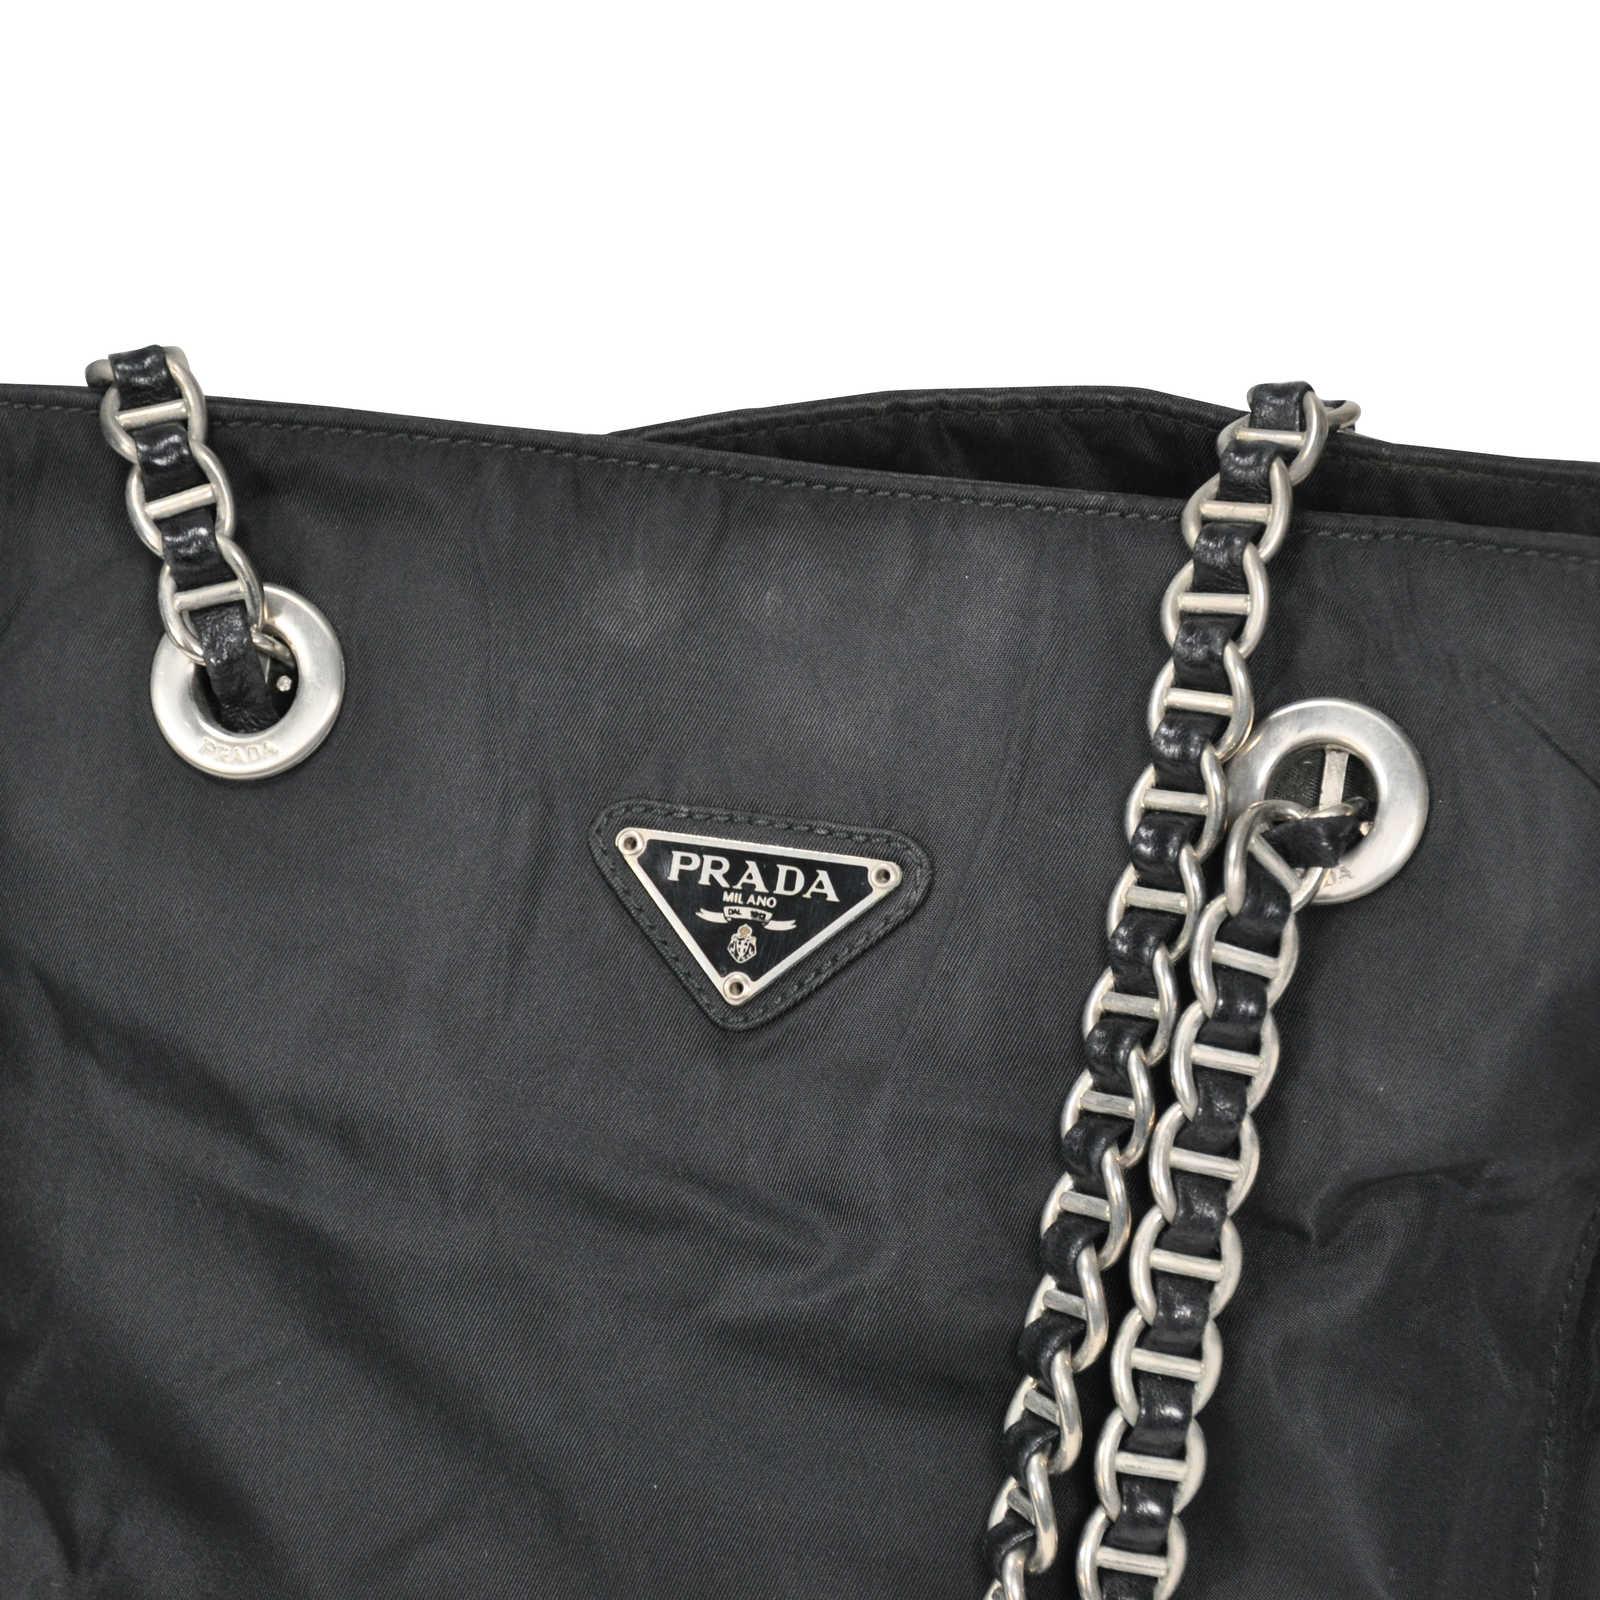 second hand prada chain link shoulder bag the fifth collection. Black Bedroom Furniture Sets. Home Design Ideas